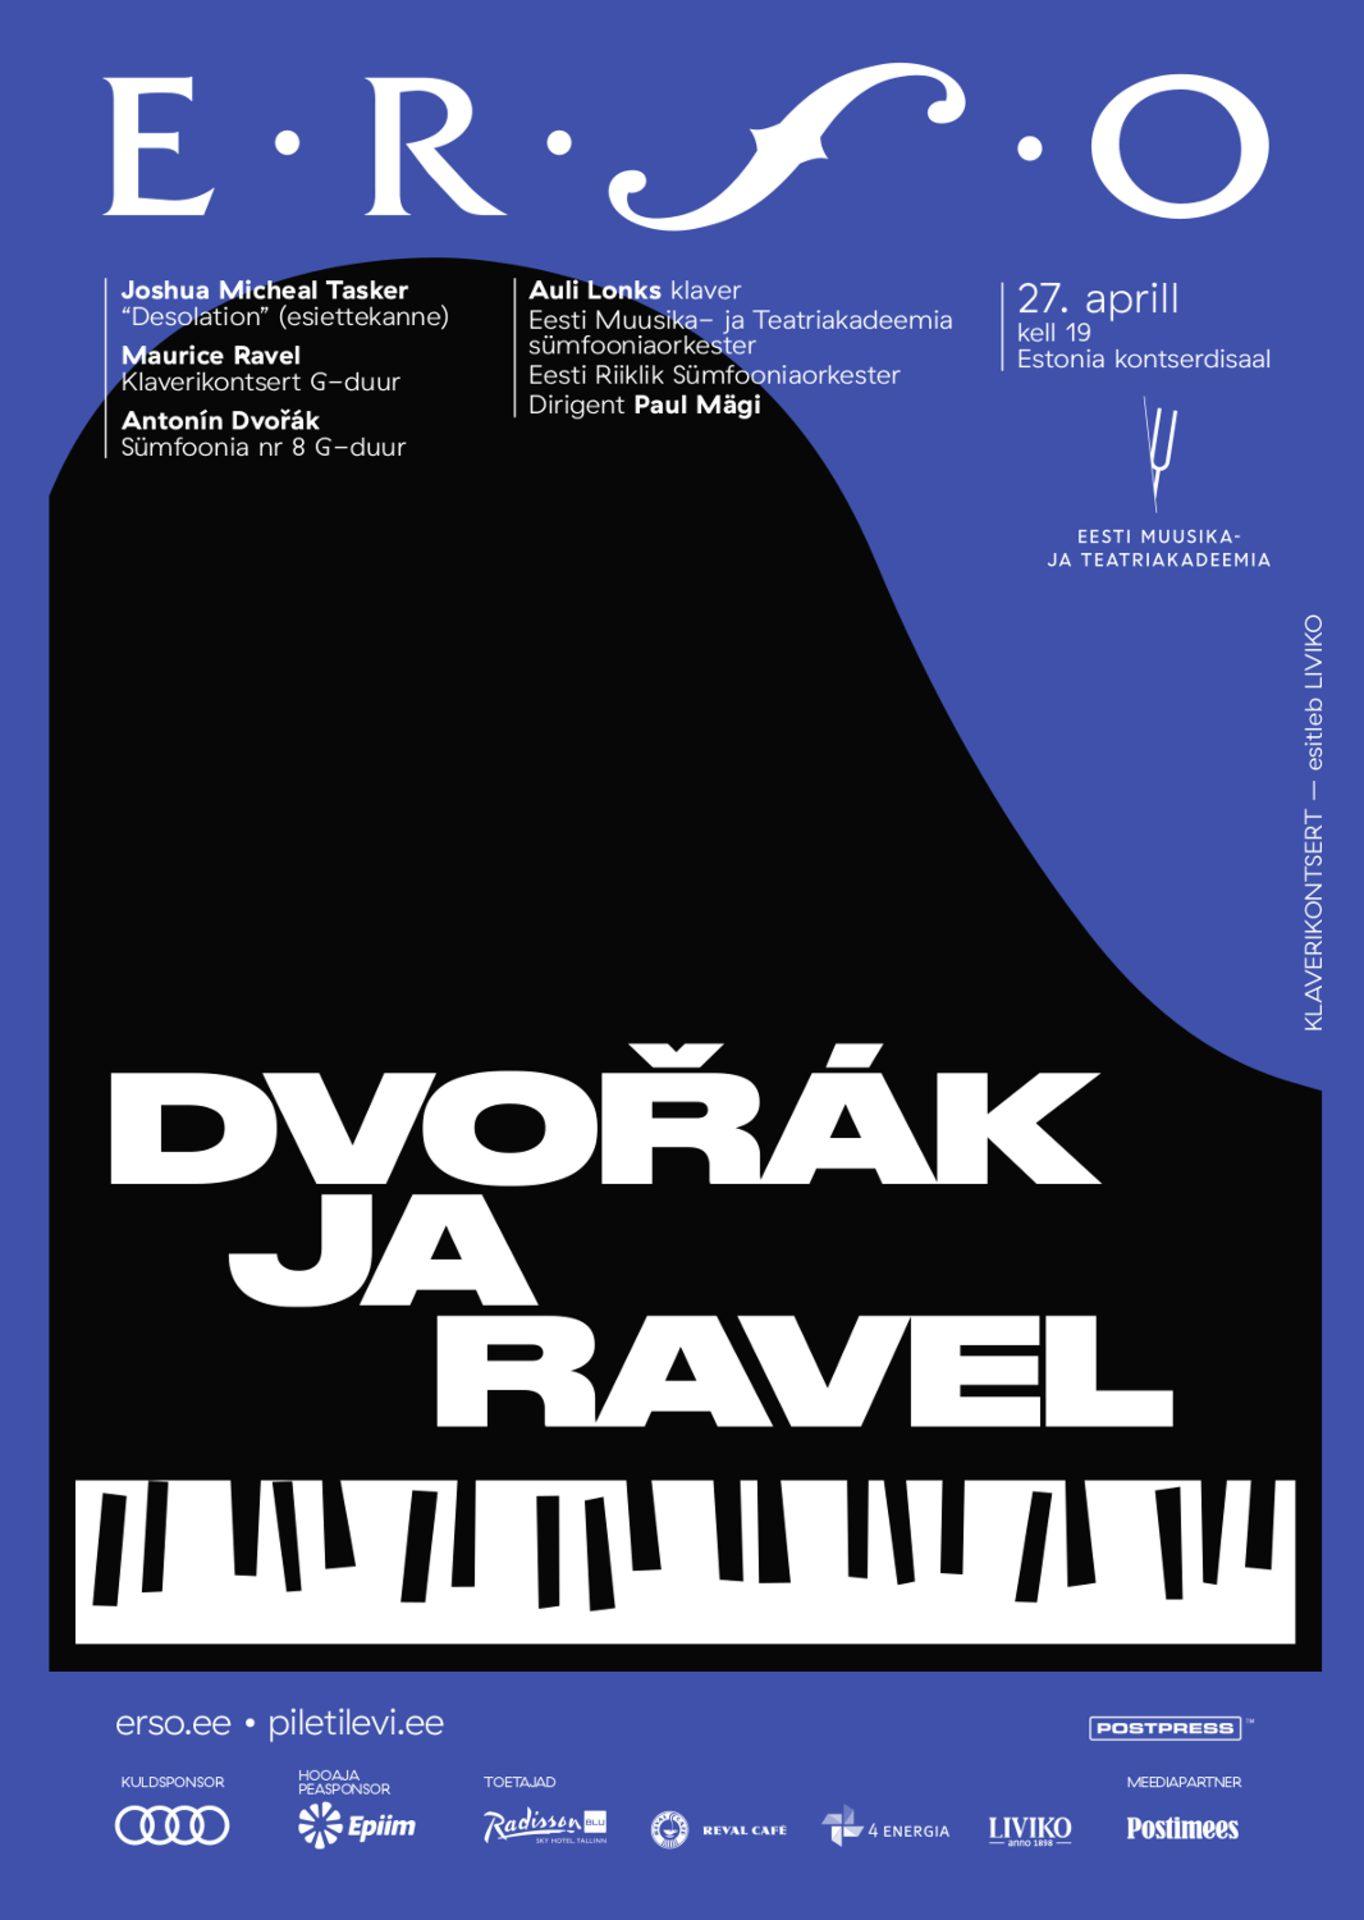 Klaverikontsert. Dvořák ja Ravel